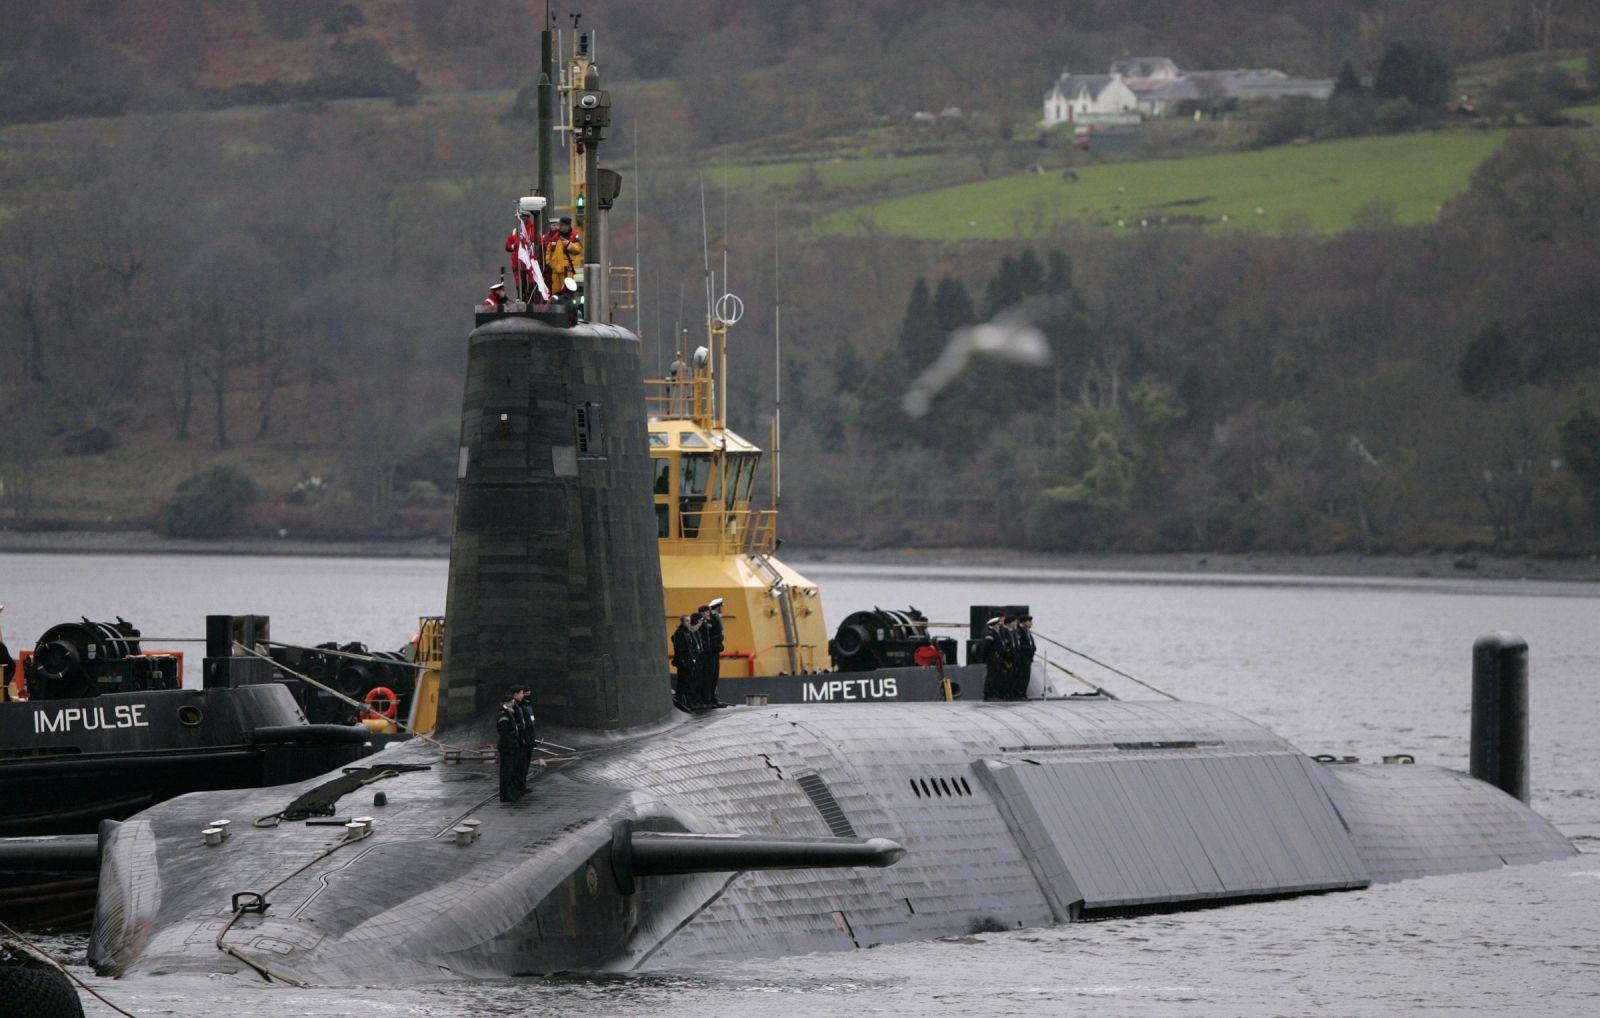 Trident nuclear submarine